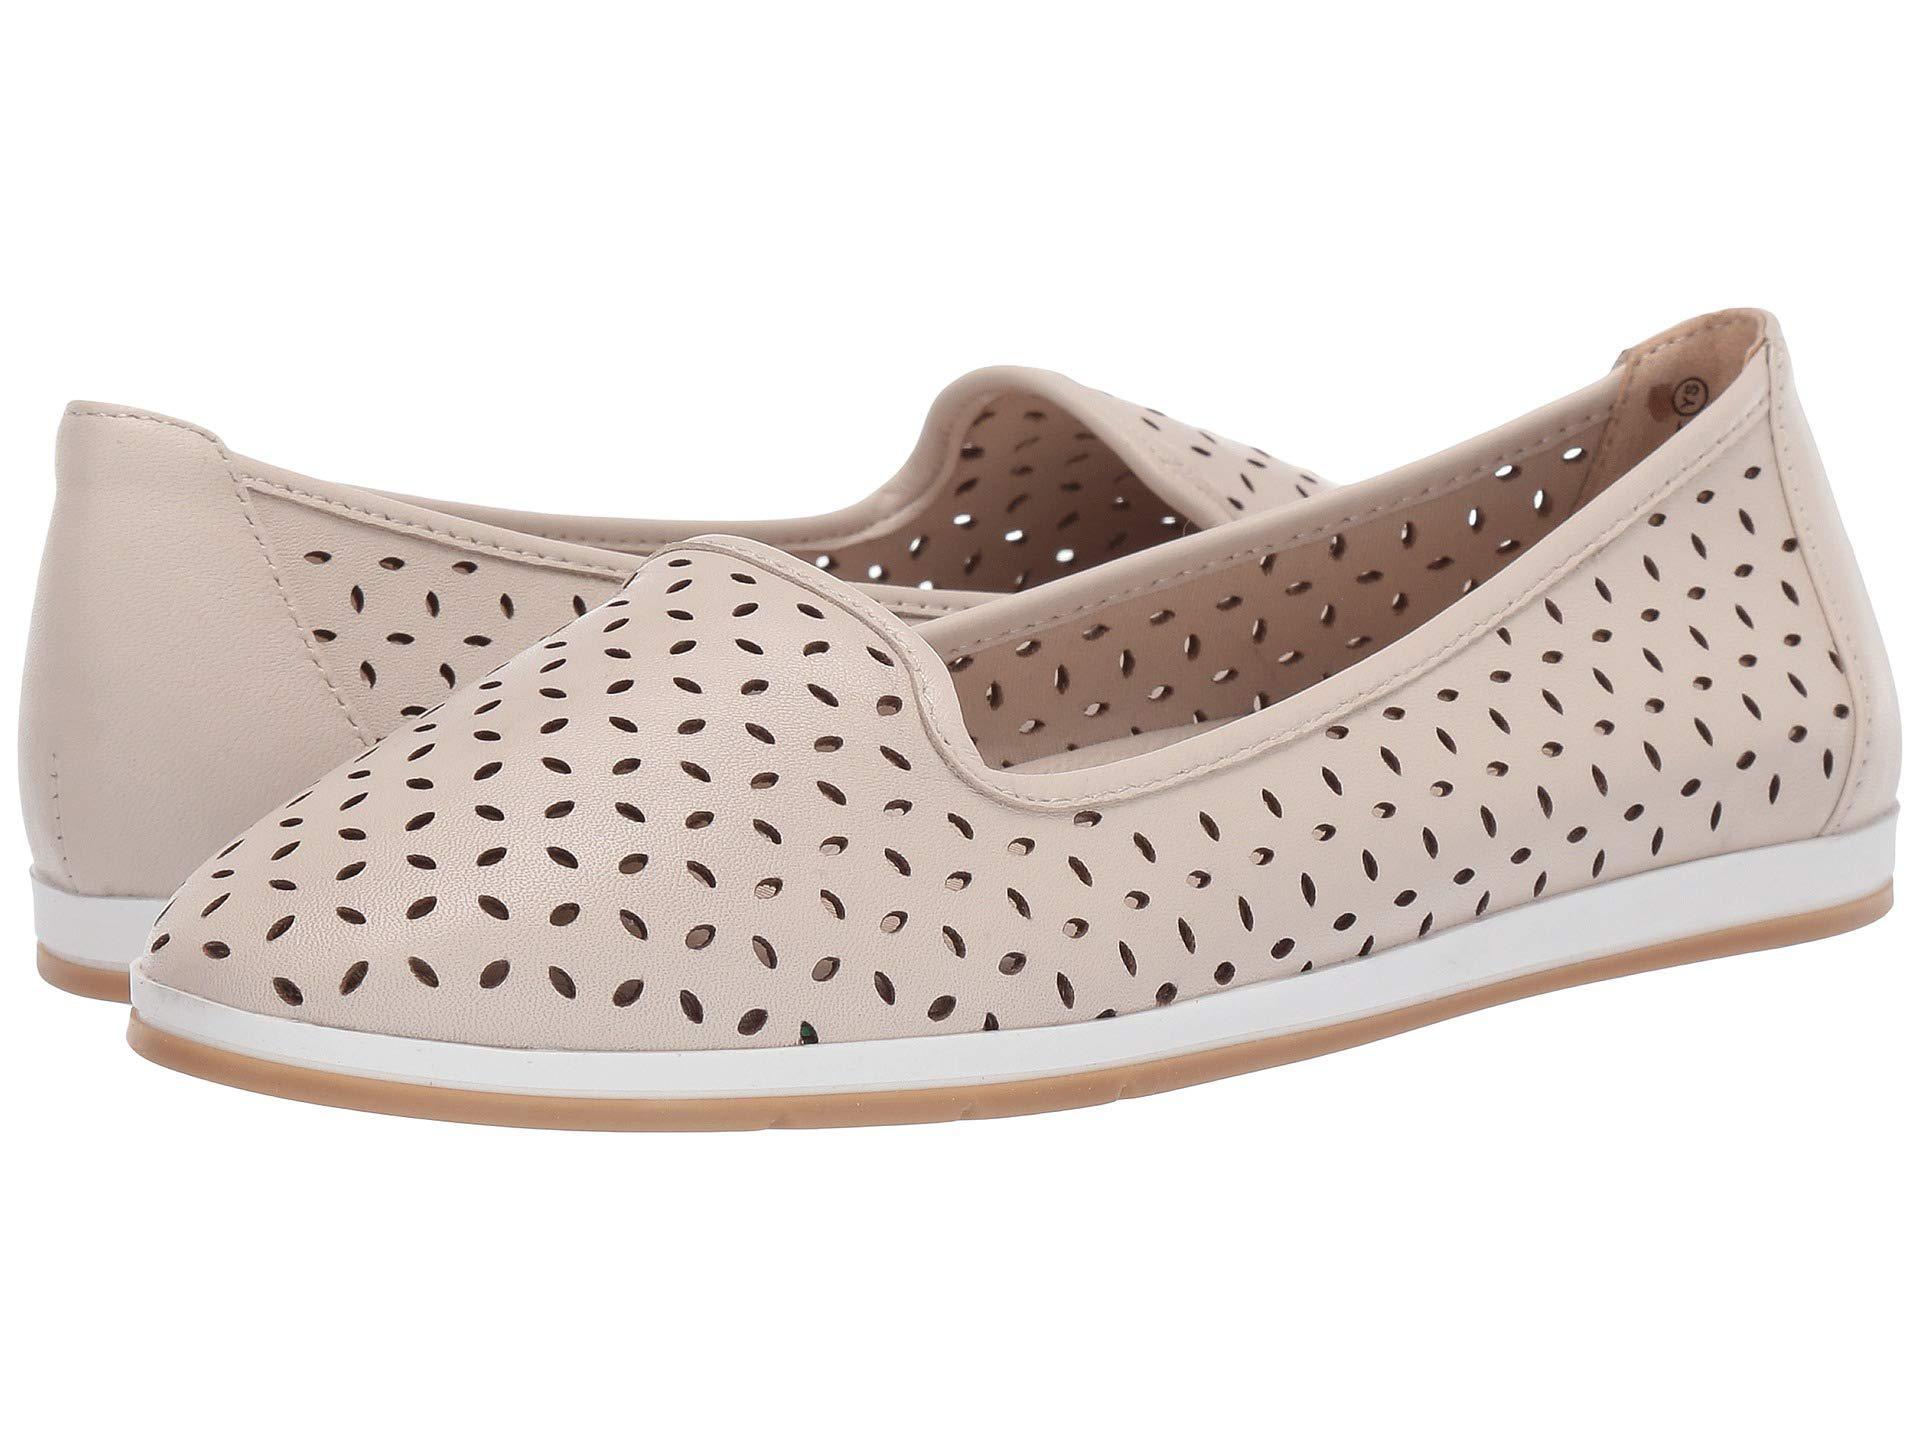 419109b59f4437 Lyst - Aerosoles Stay Smart (gold Leather) Women s Shoes